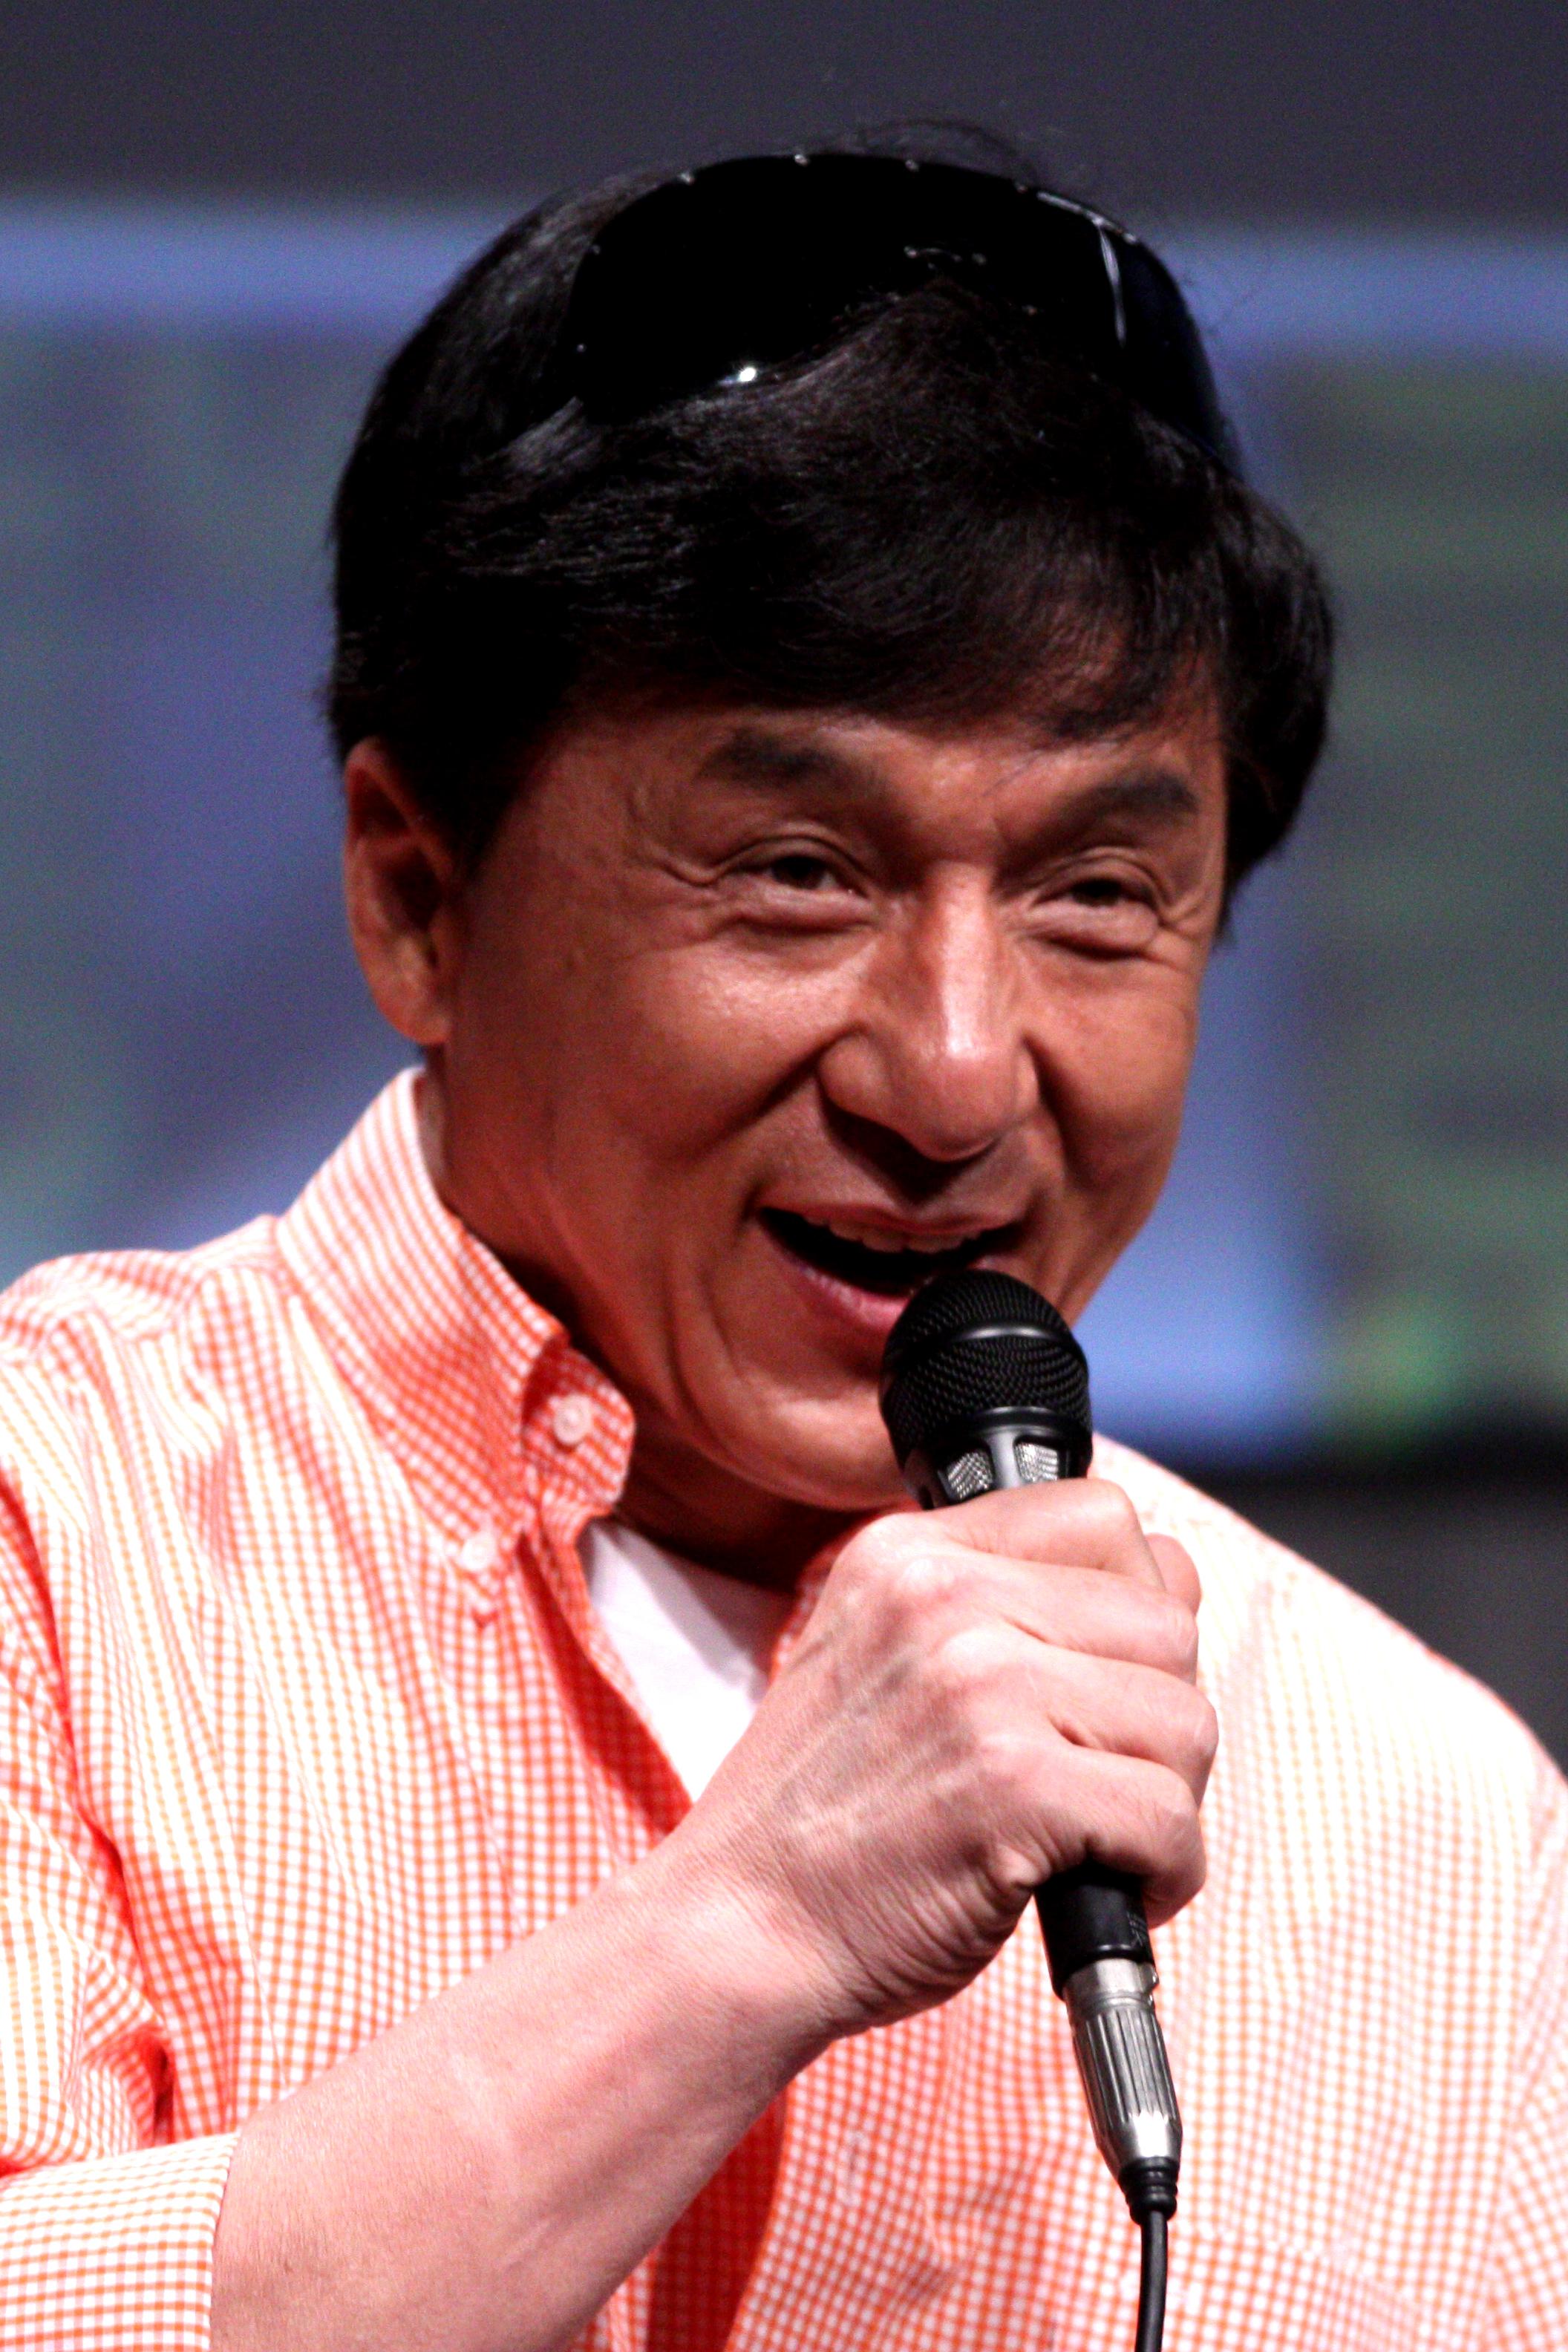 Jackie Chan photo #105235, Jackie Chan image